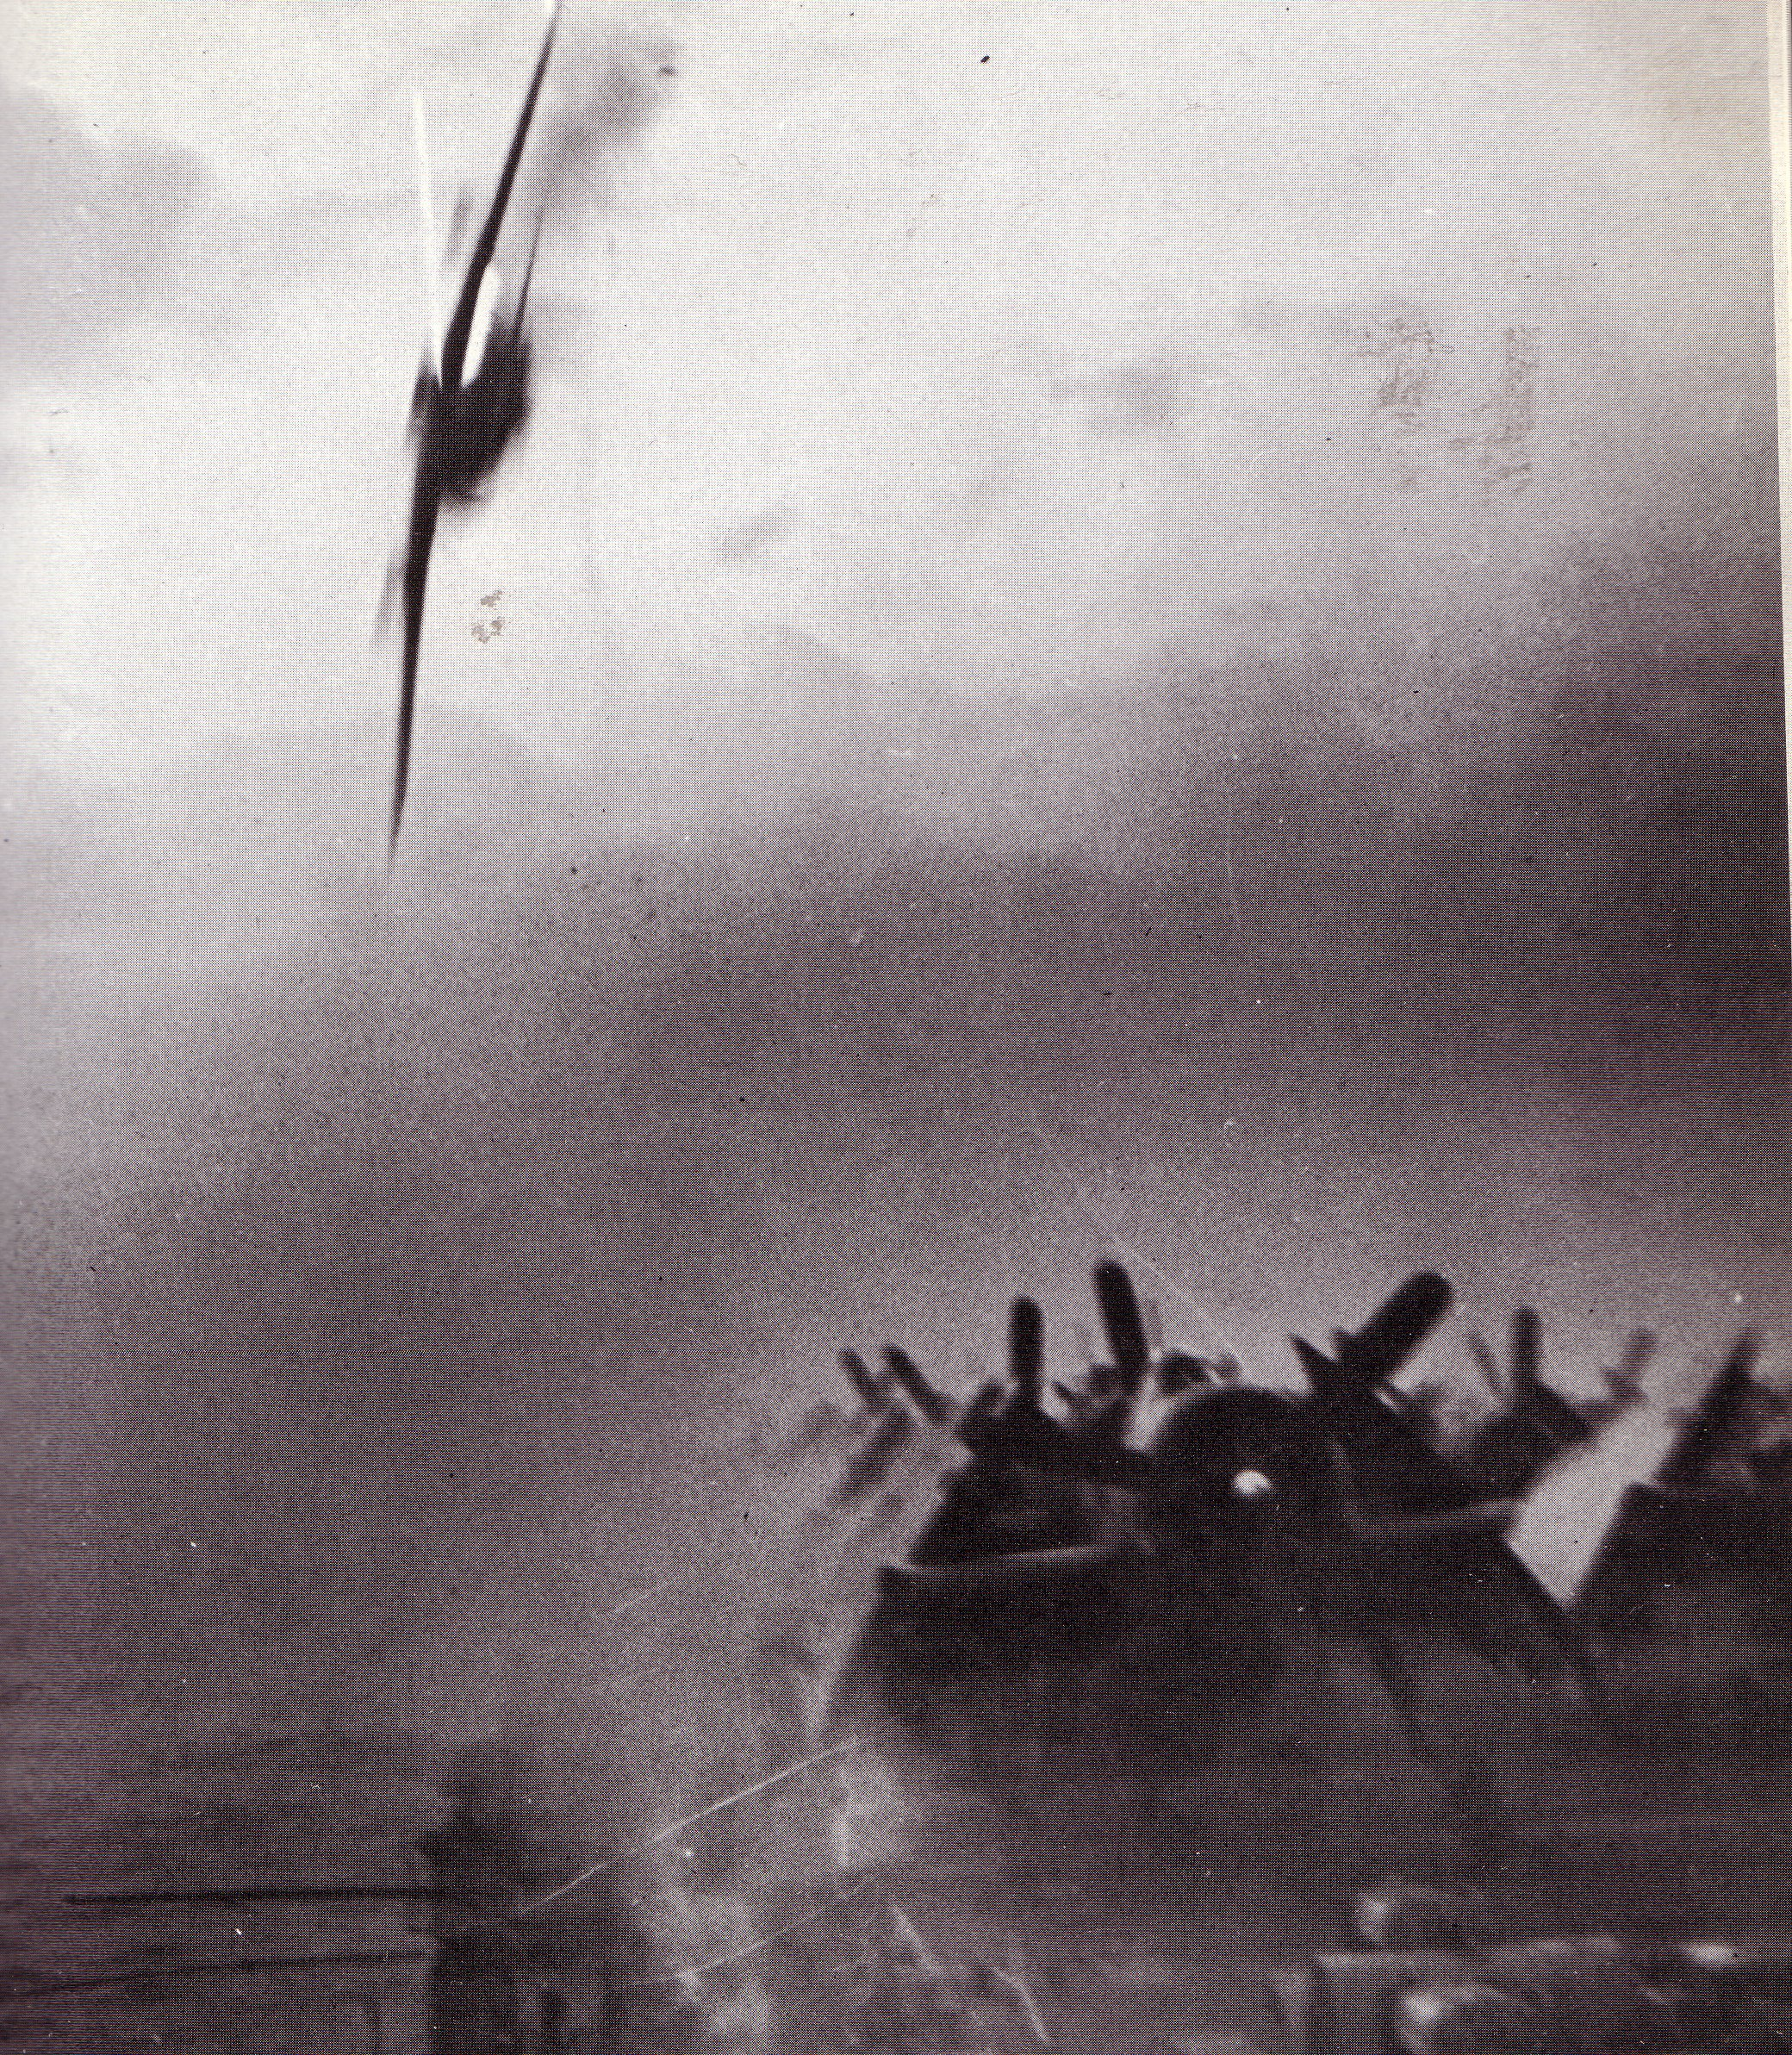 bombas atomicas